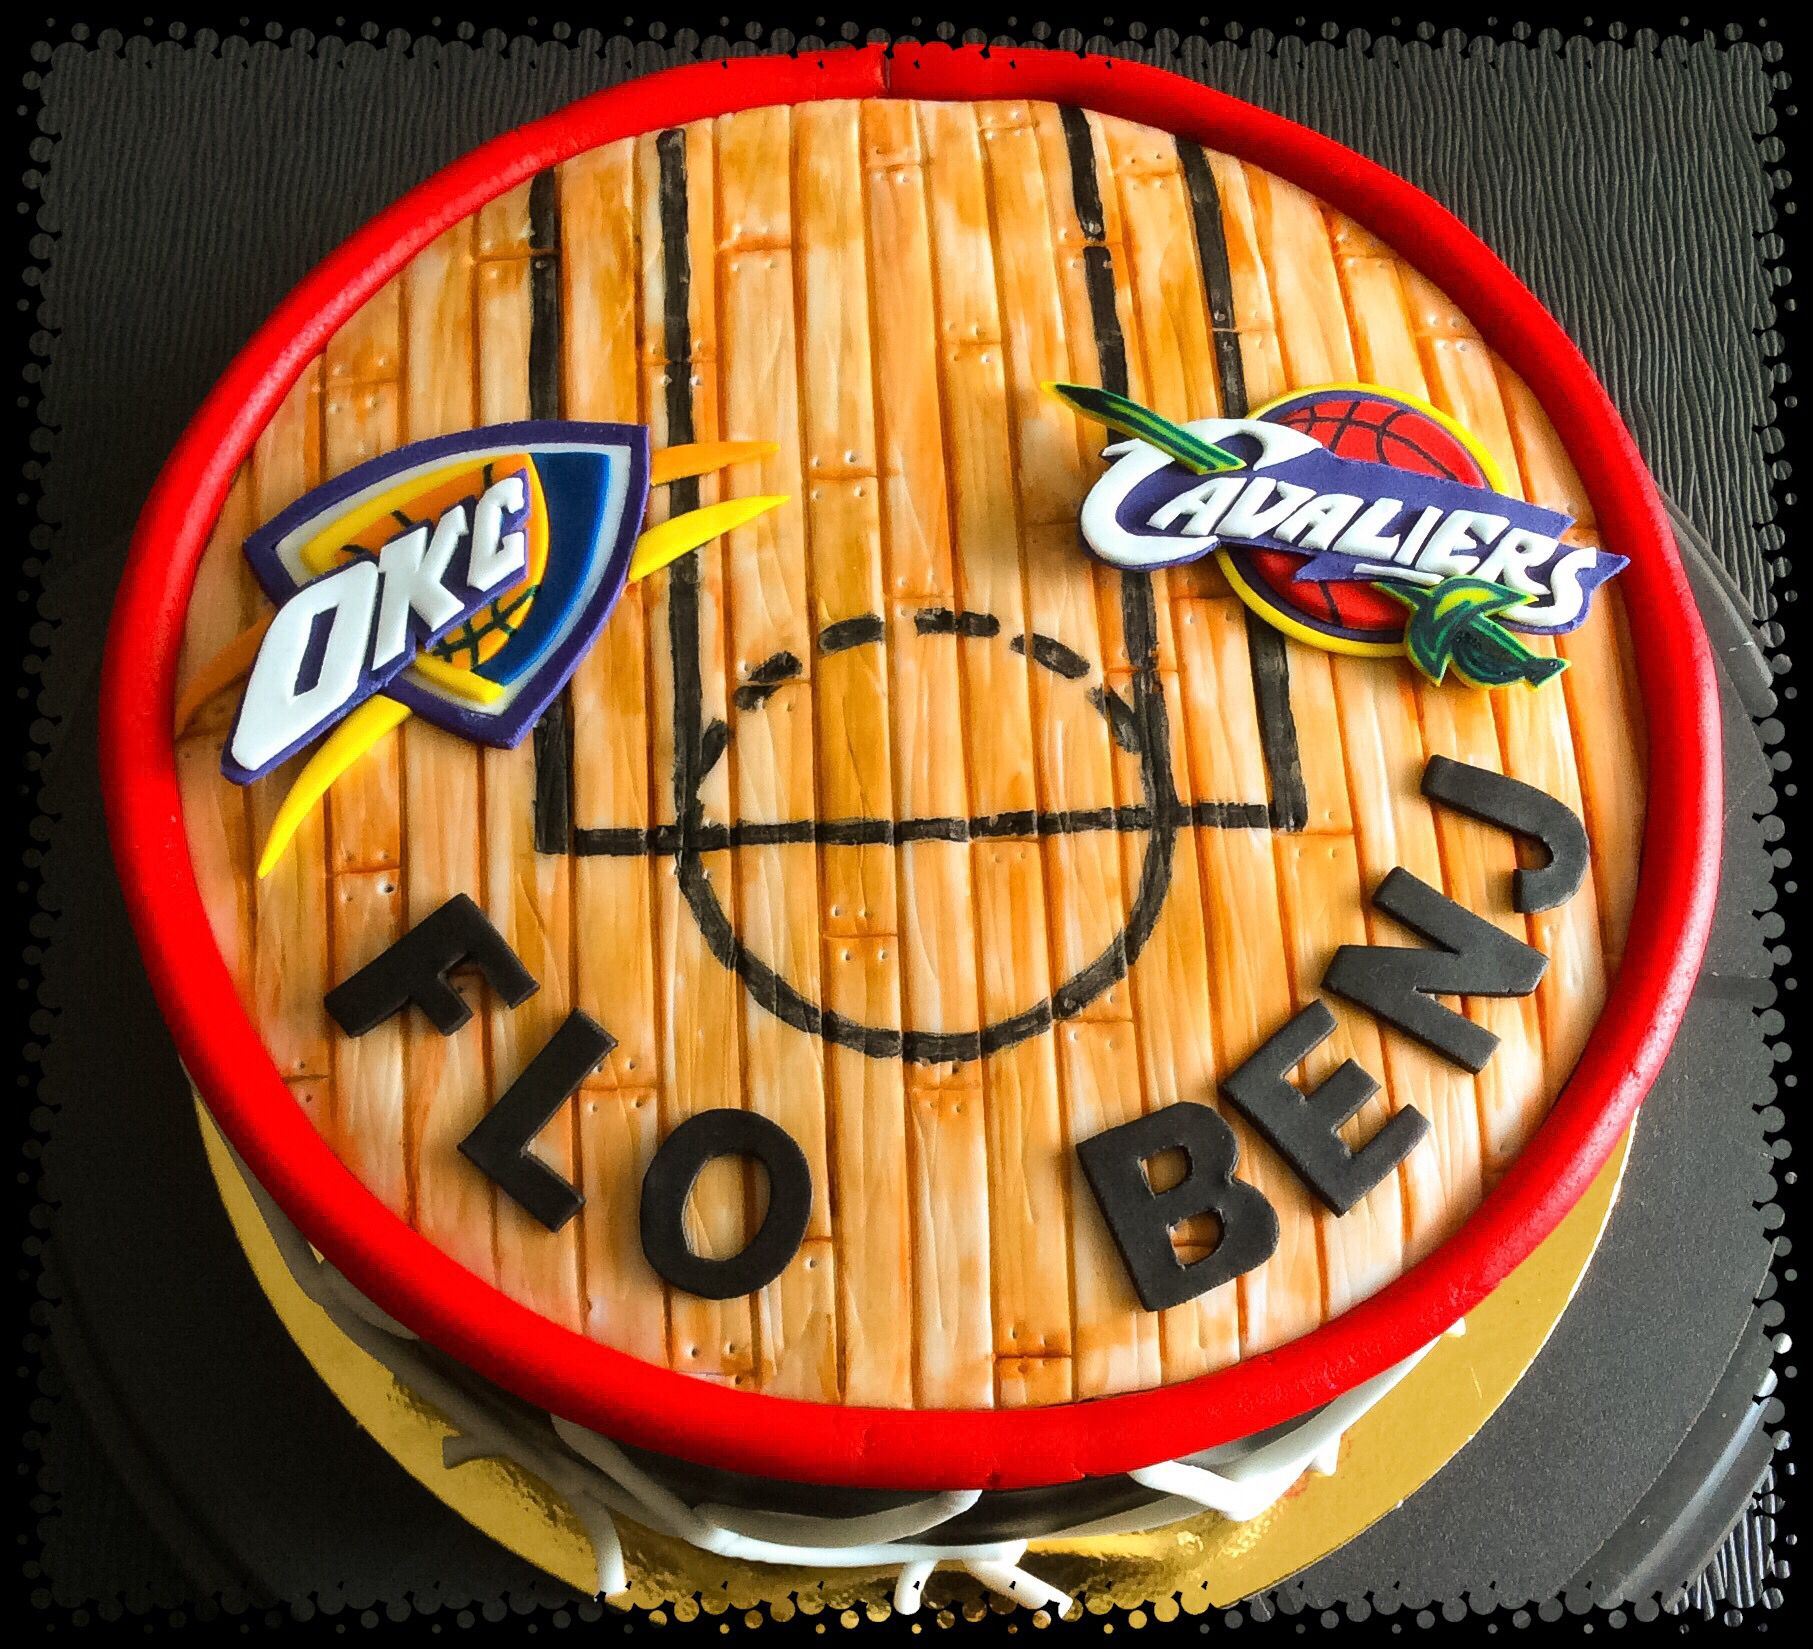 Cake Design Basketball NBA Theme : OKC Thunder Vs